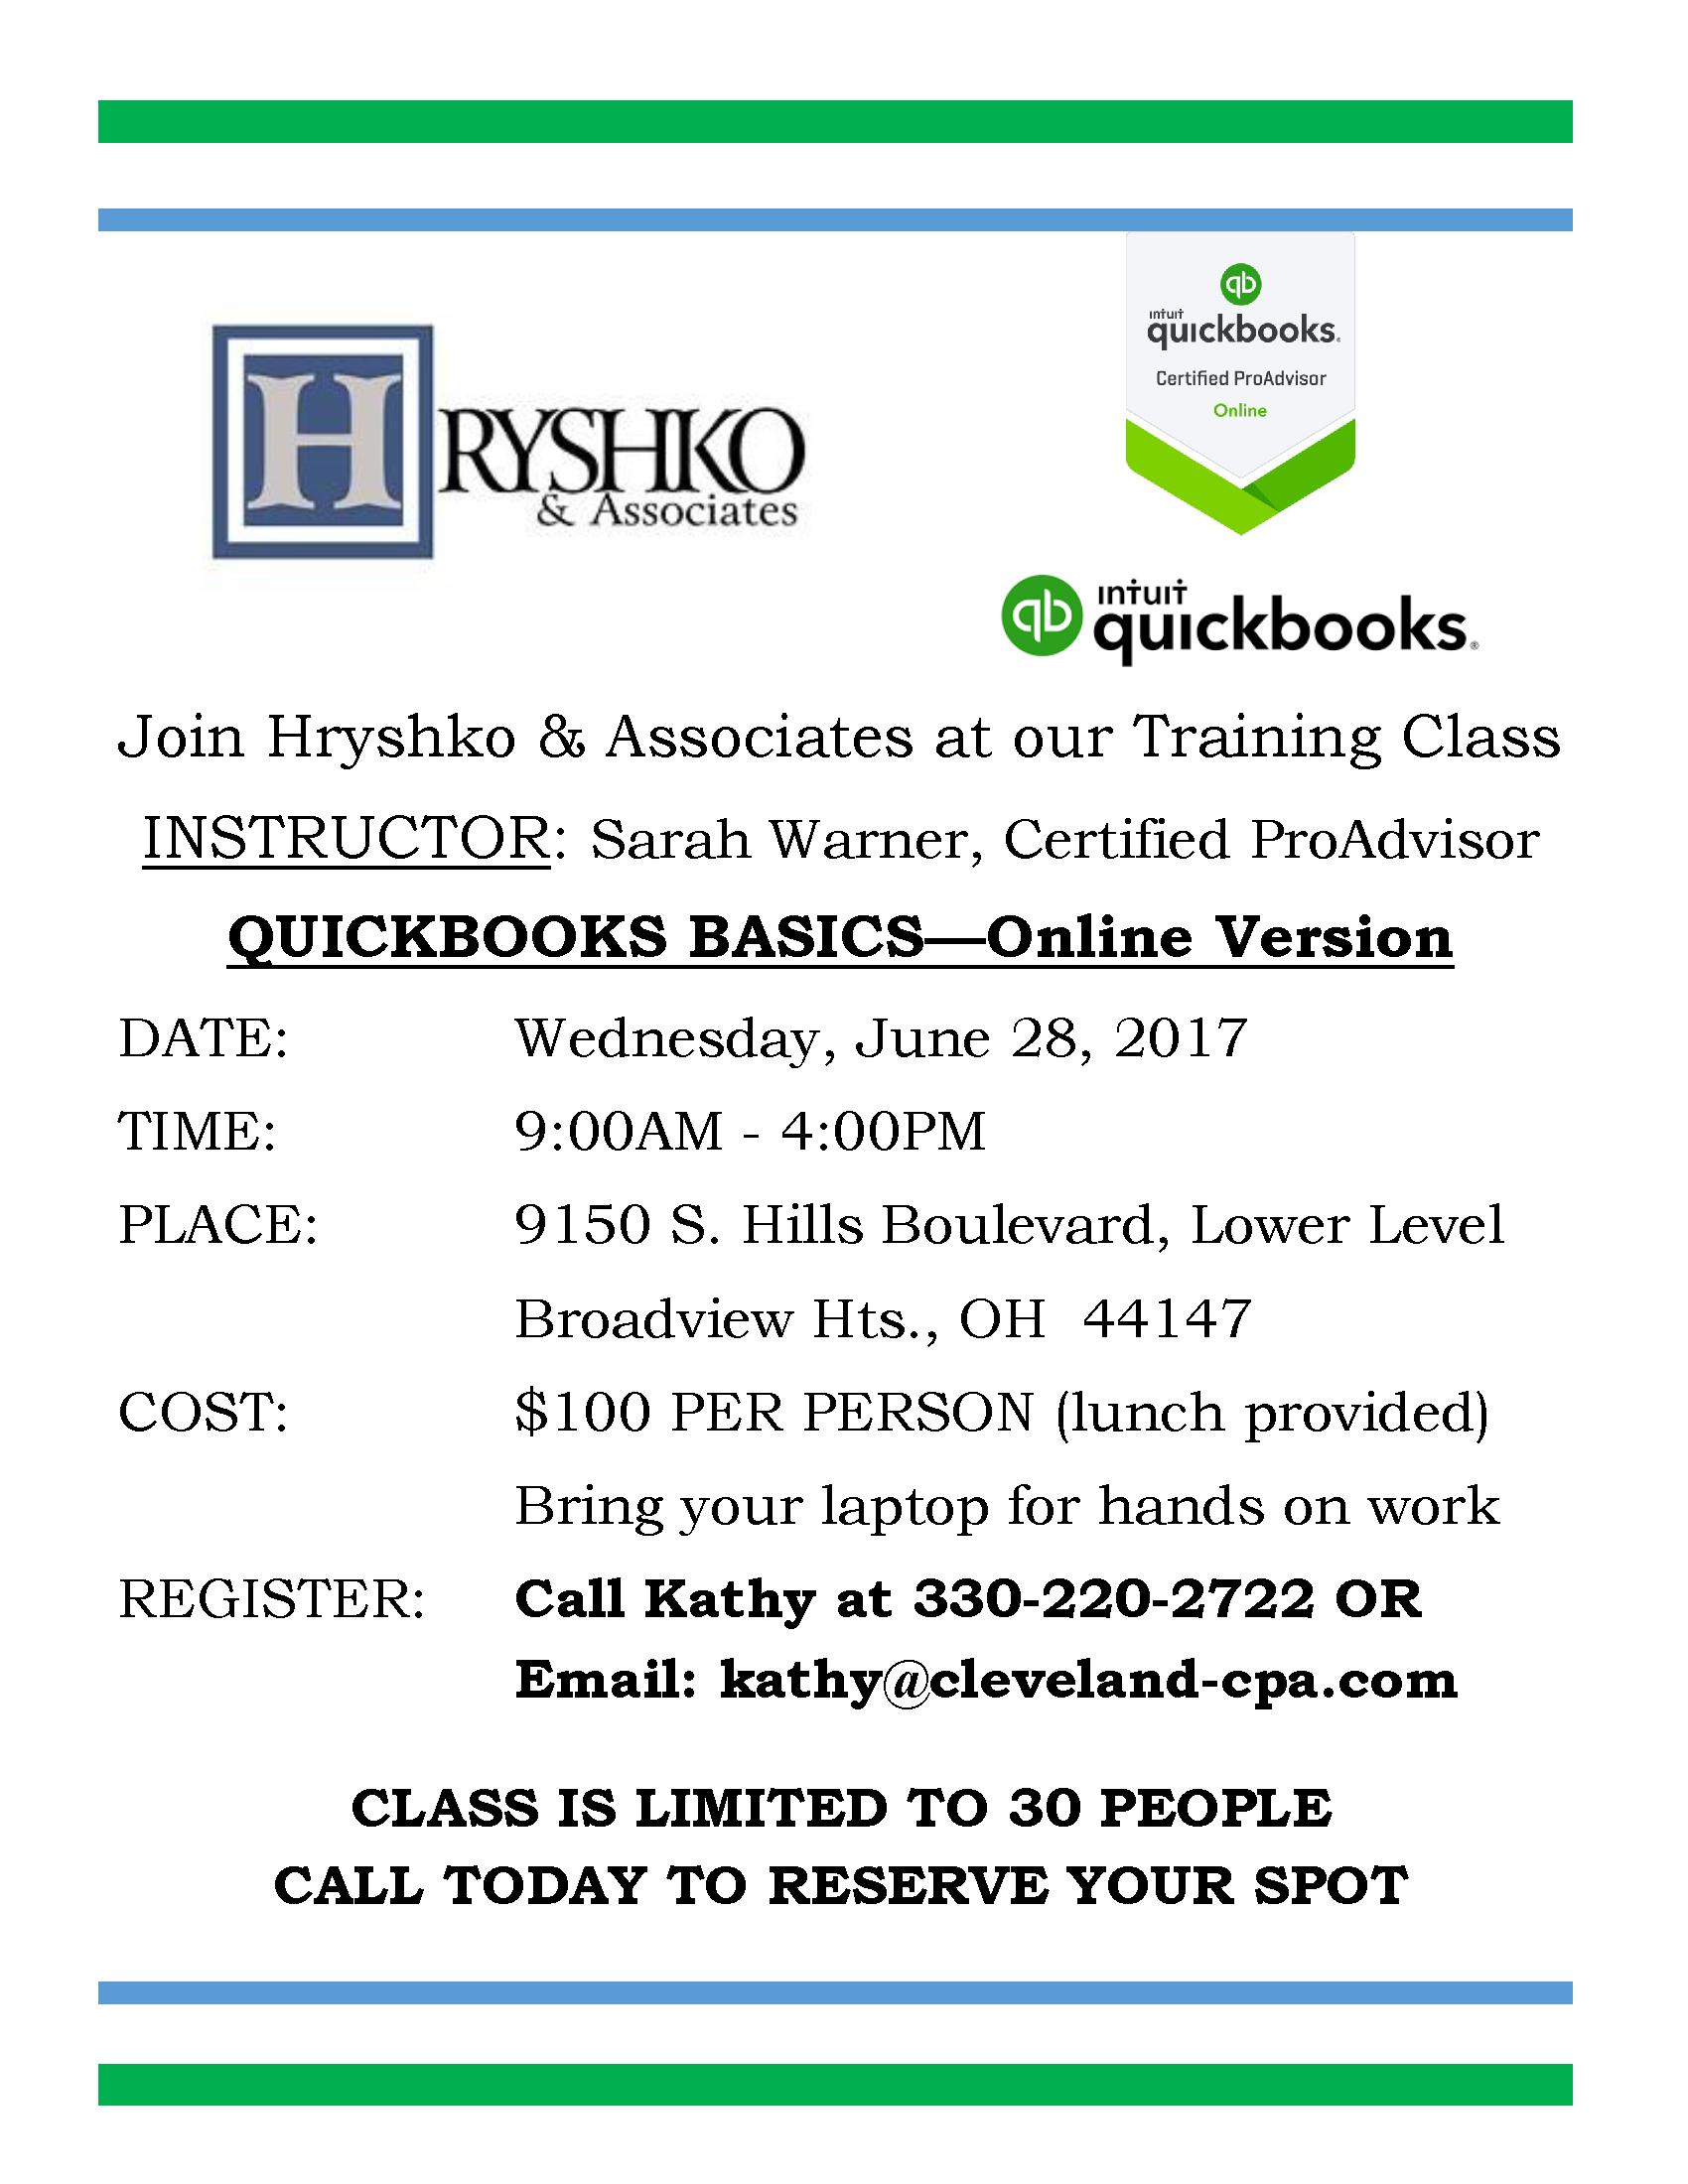 QuickBooks Class